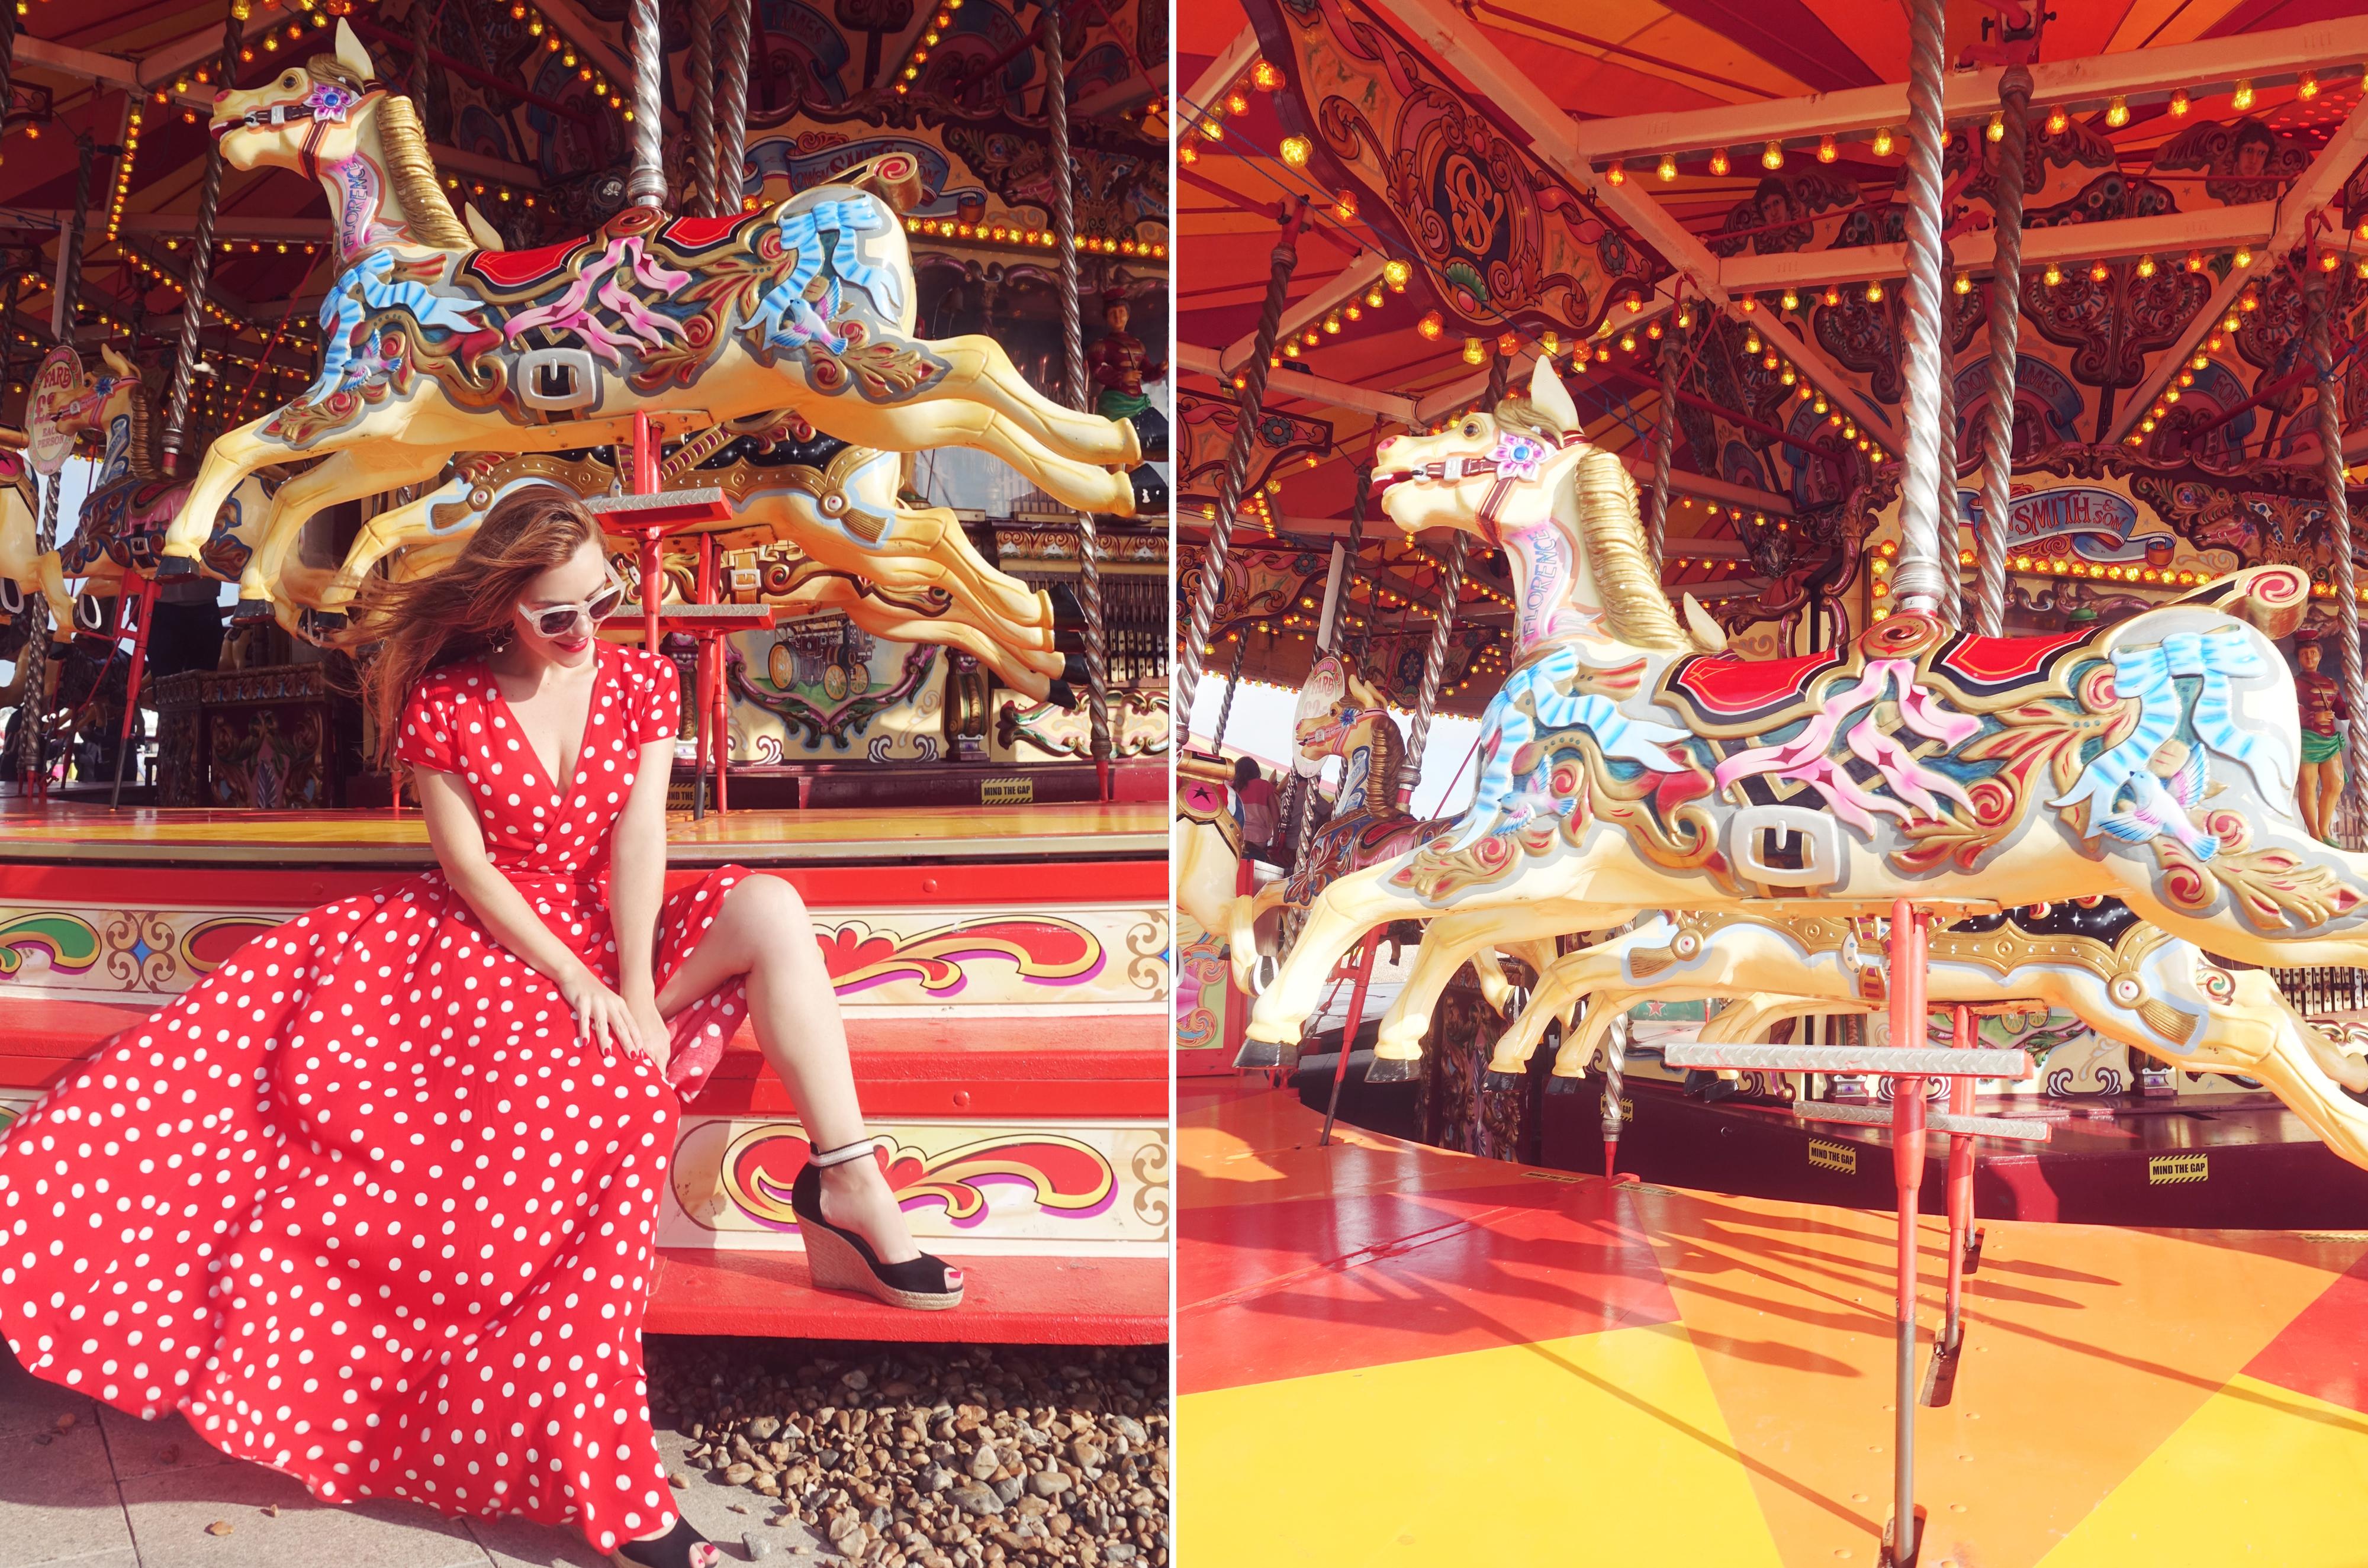 floryday-vestidos-lunares-PiensaenChic-fashionista-ChicAdicta-blog-de-moda-travel.influencer-Brighton-Chic-adicta-carrousel-Piensa-en-Chic